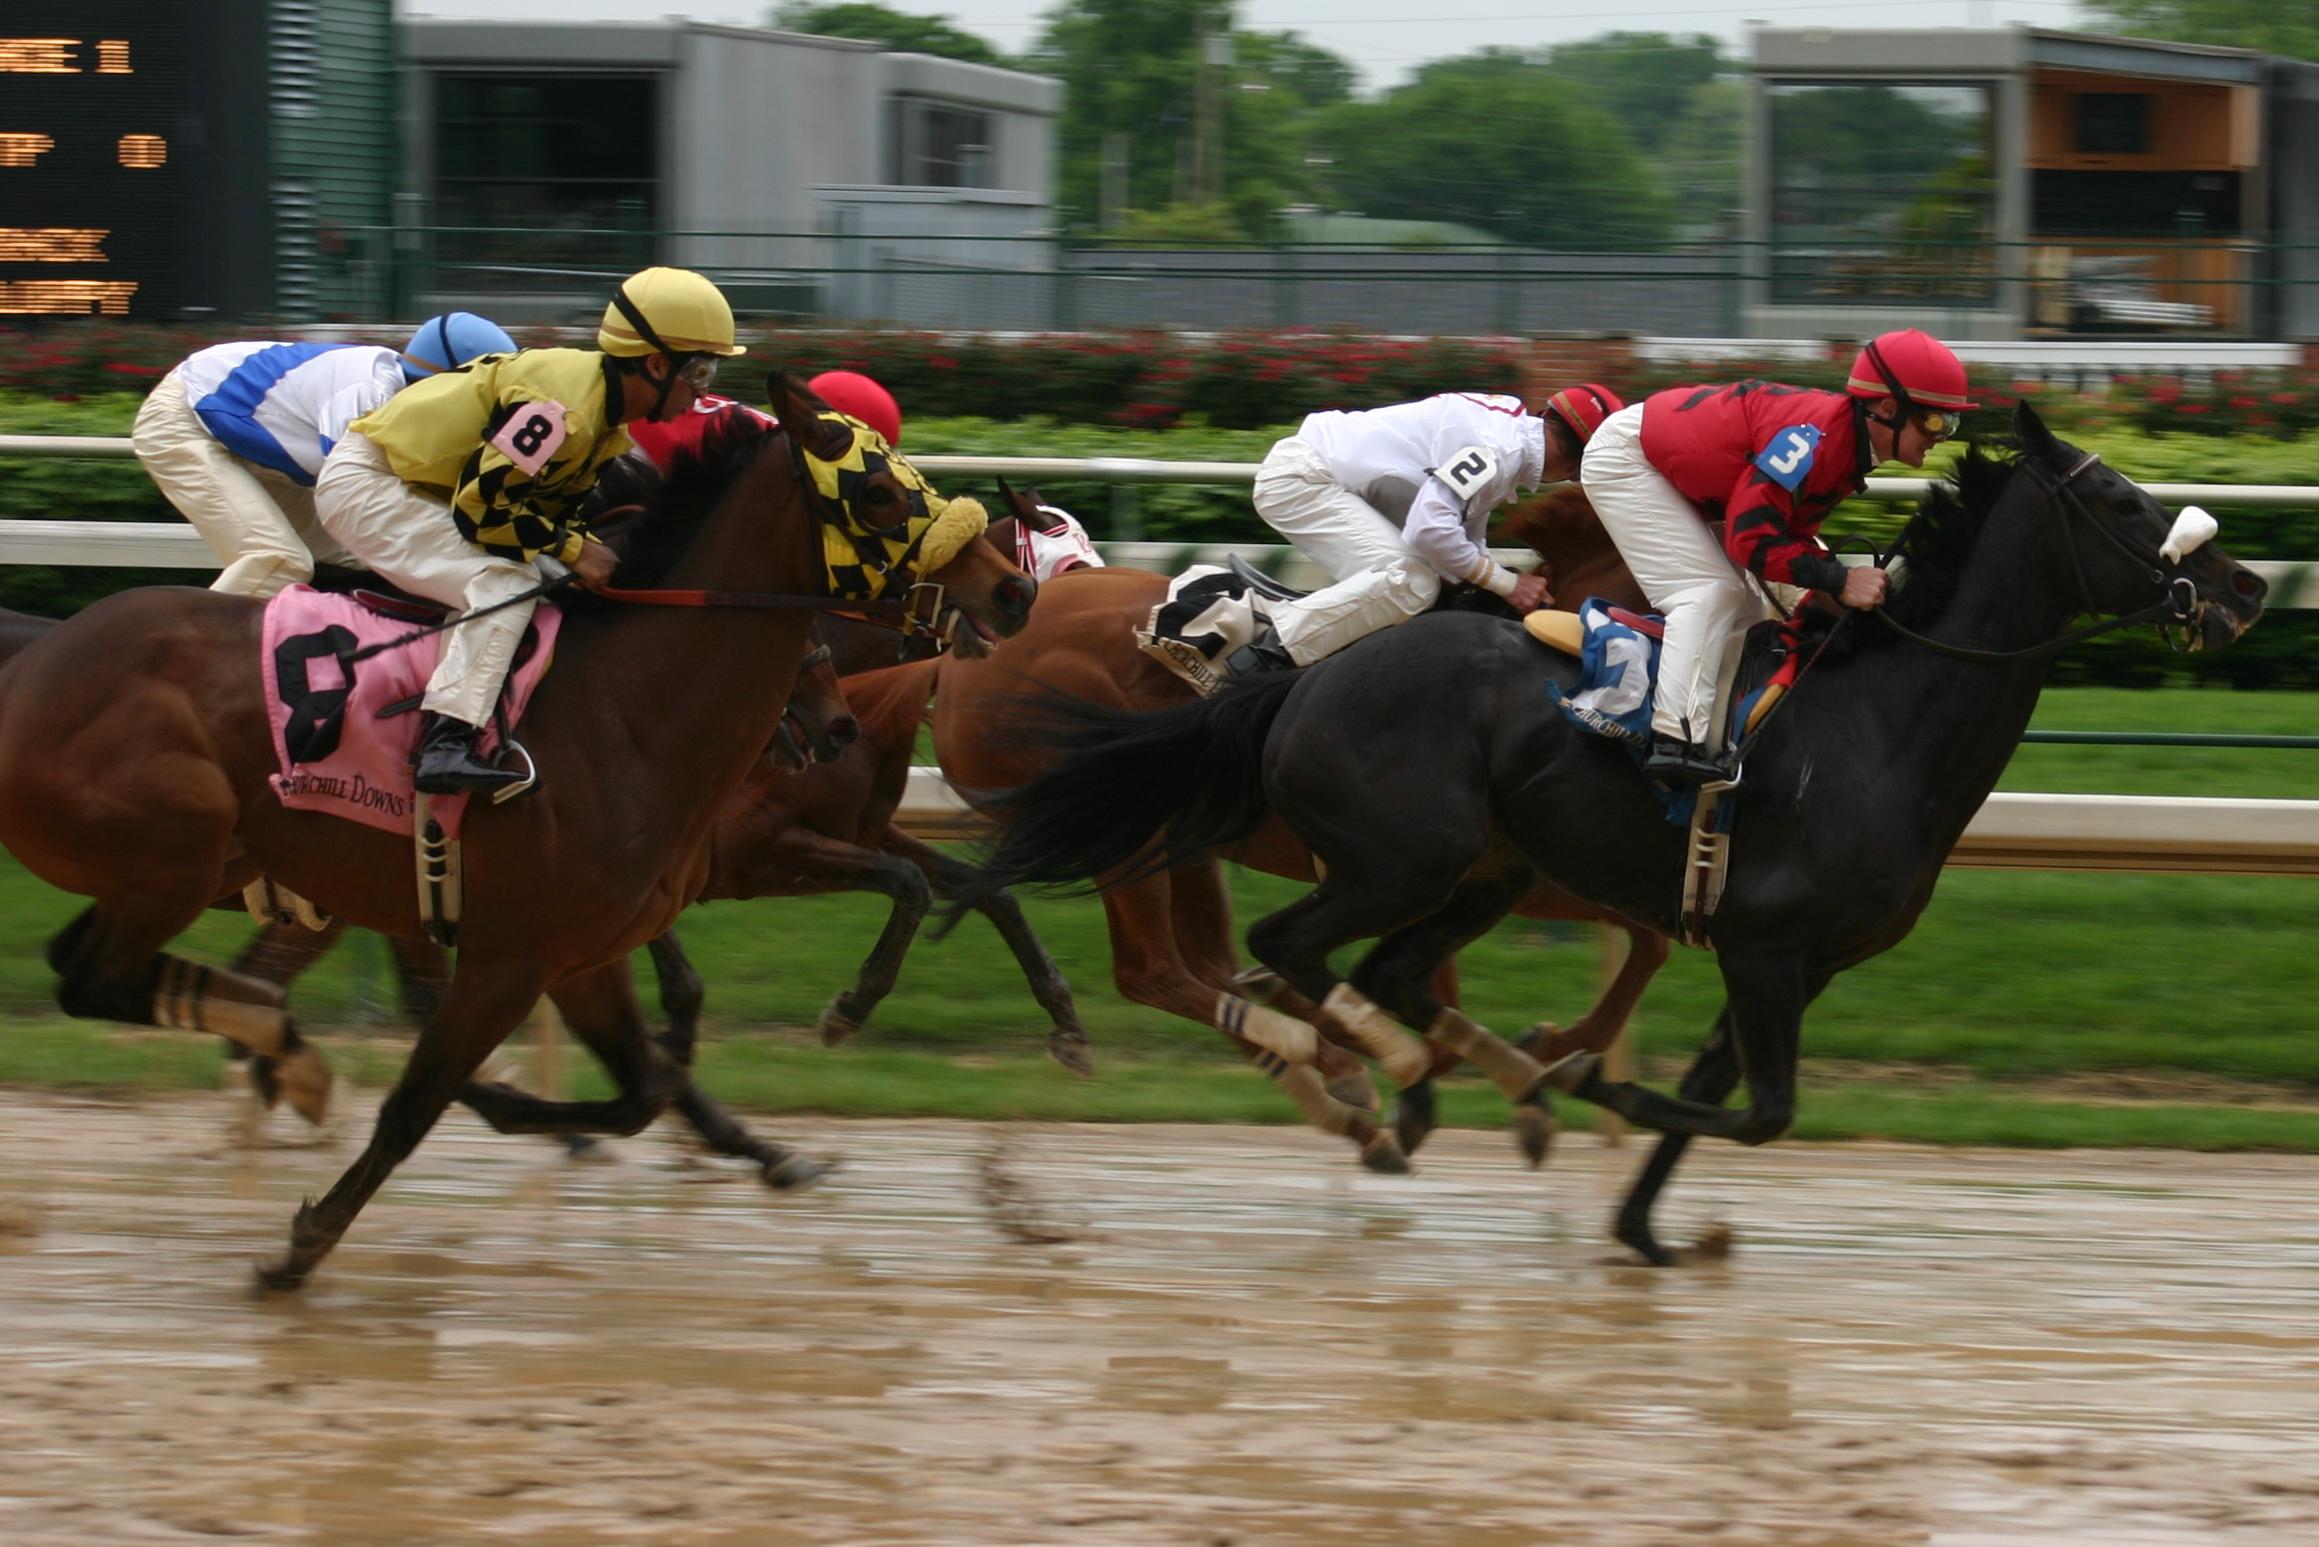 racing horse racing